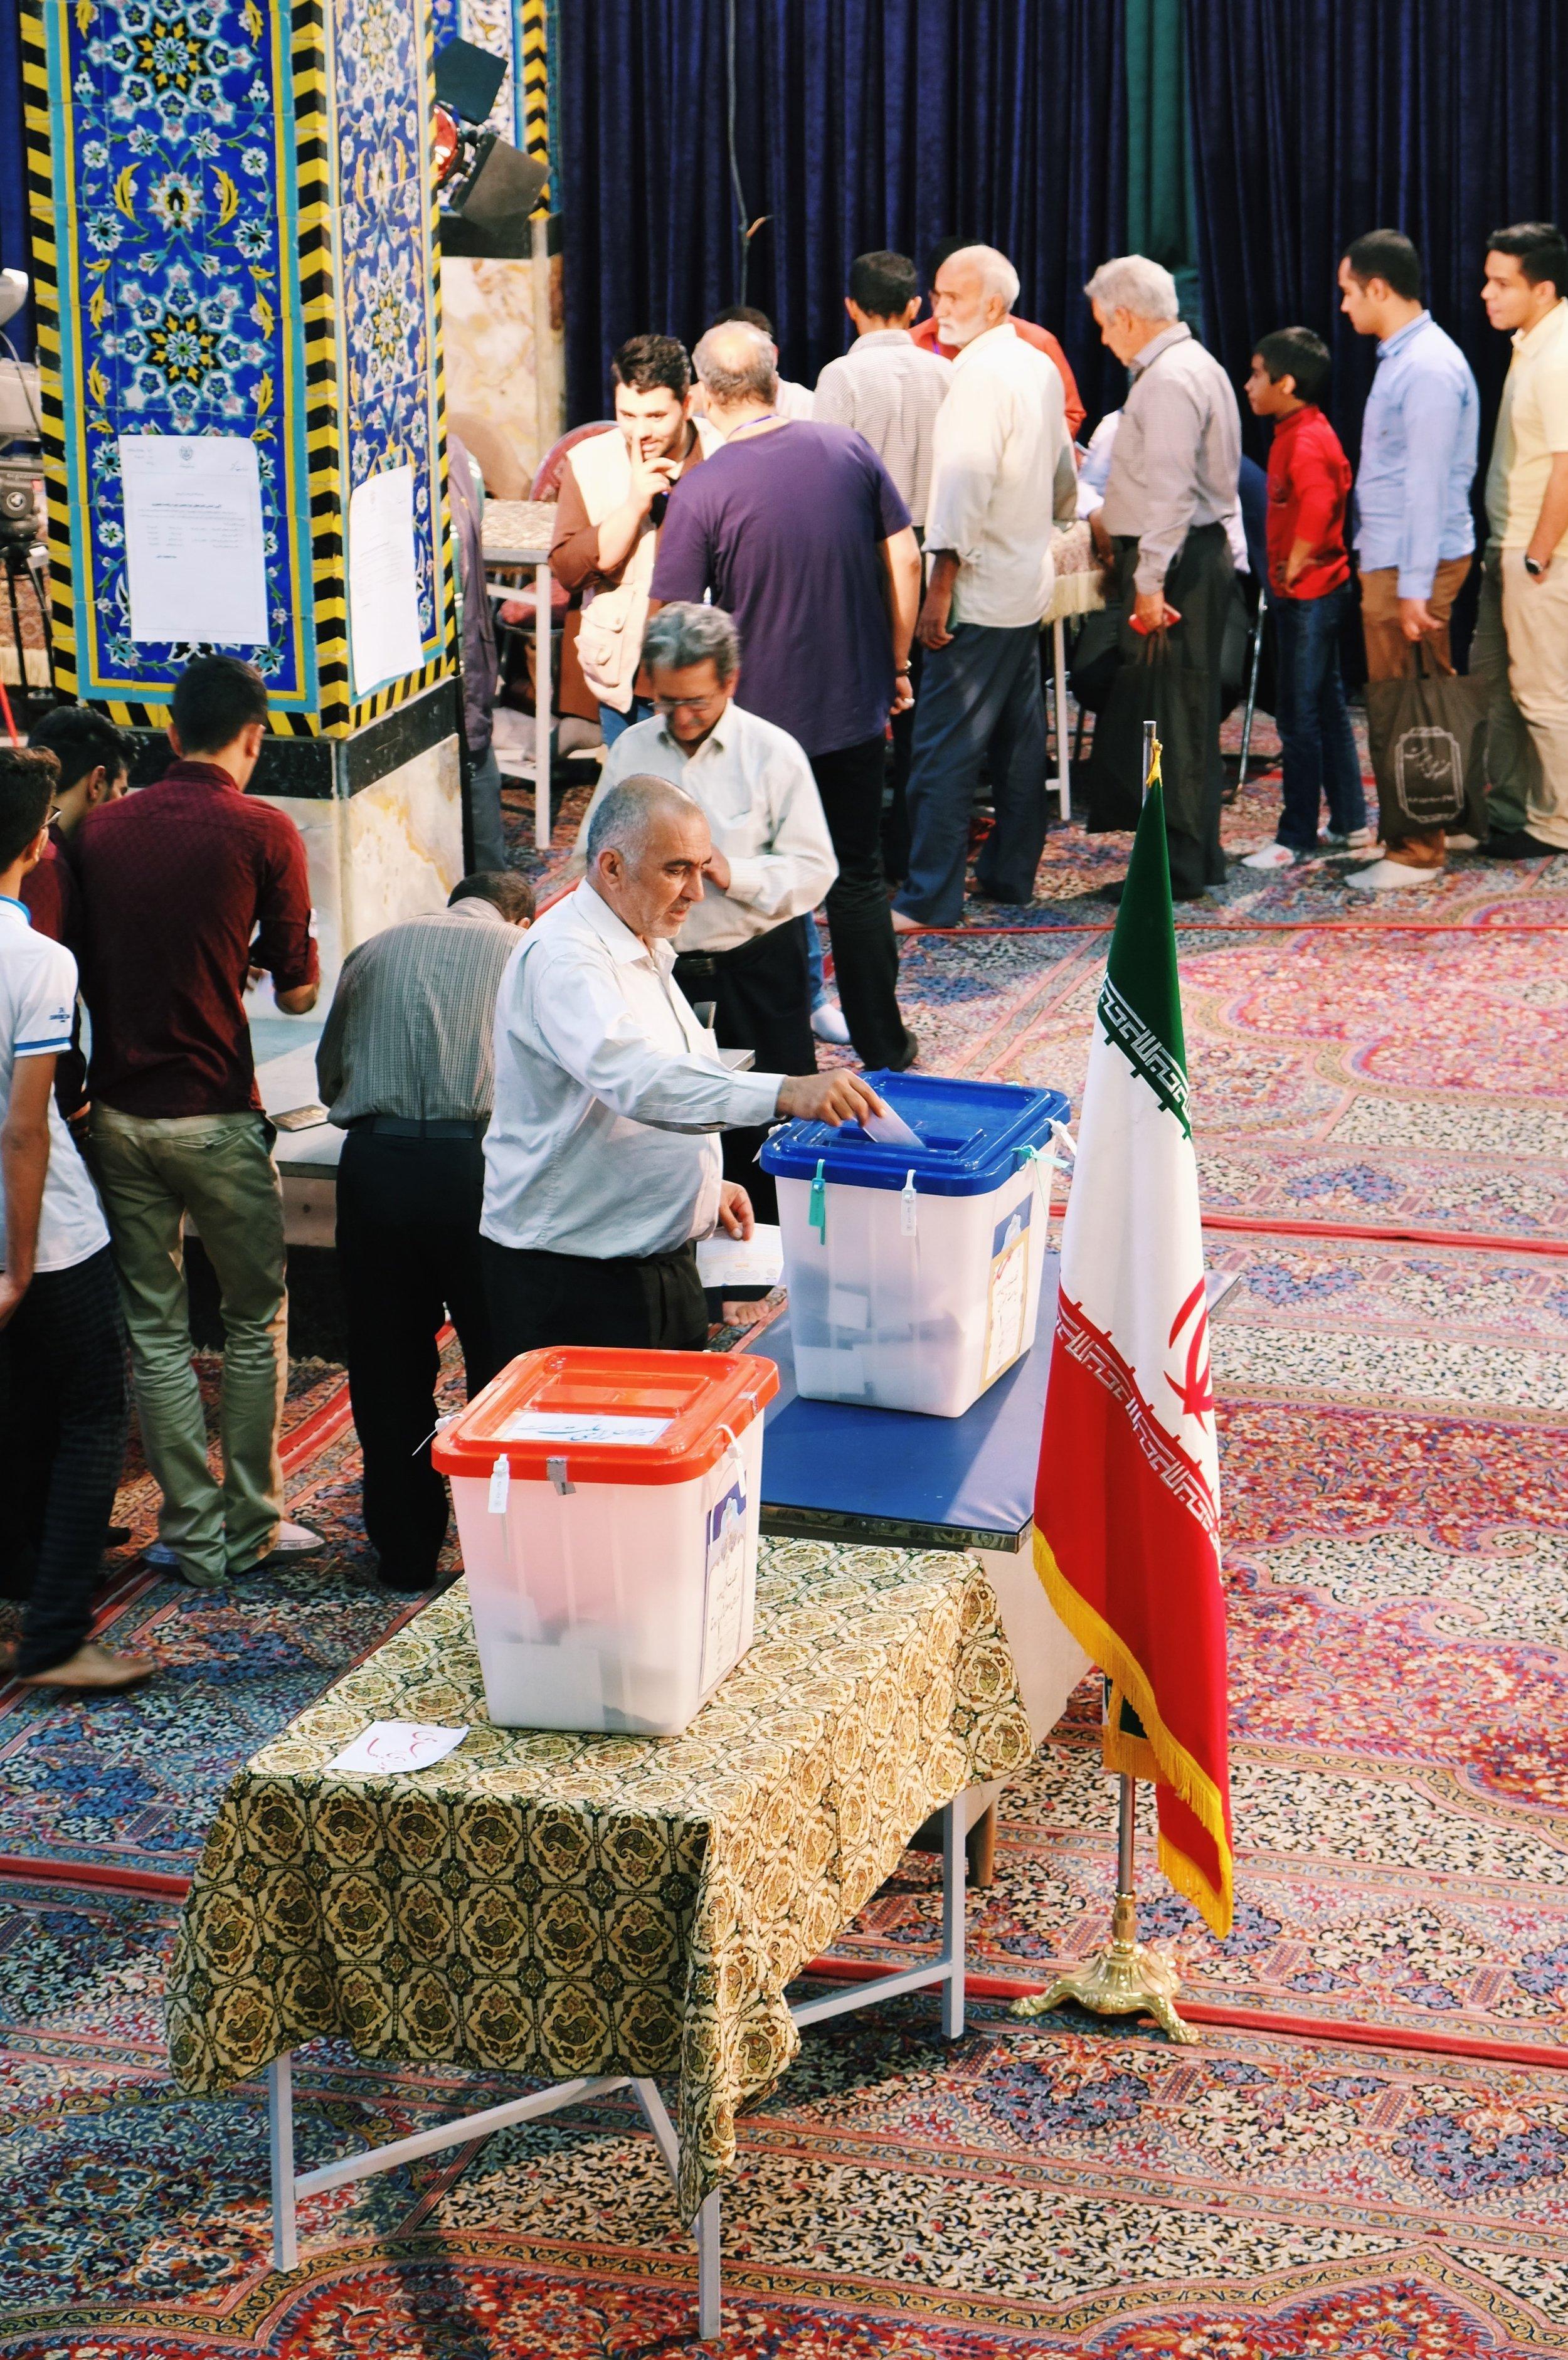 Iran Elections in Yazd by Joost Bastmeijer.jpeg